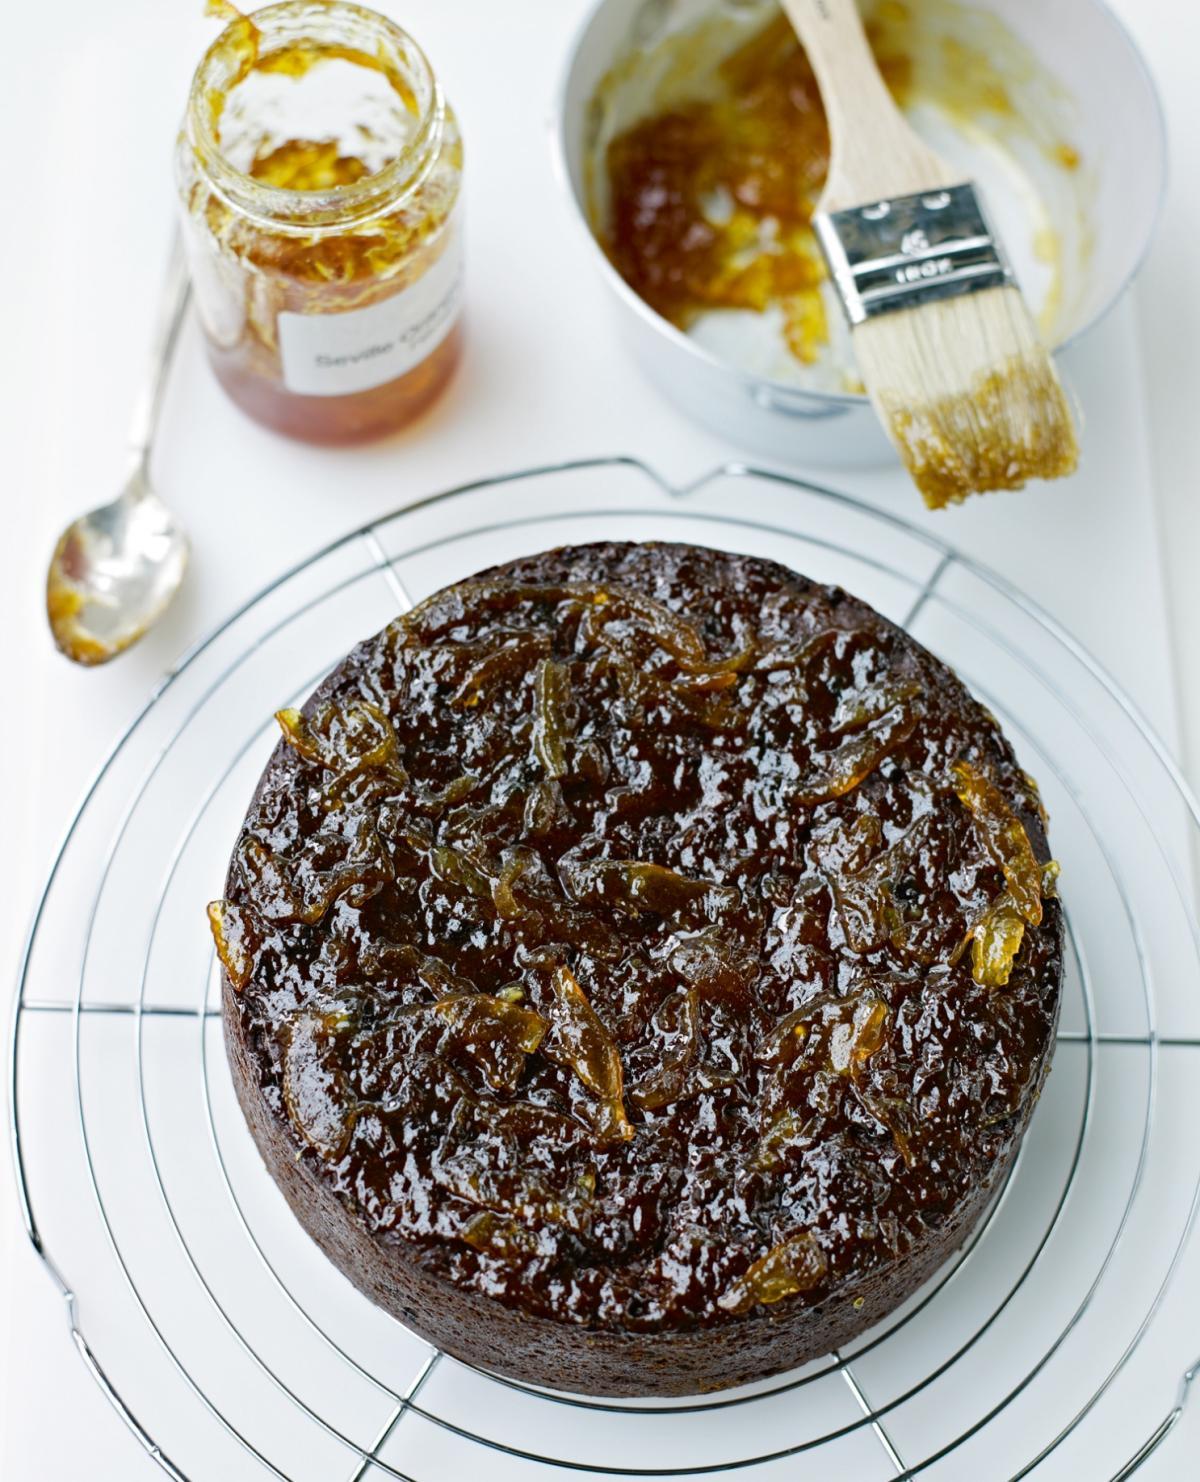 A picture of Delia's Cake Recipes recipes